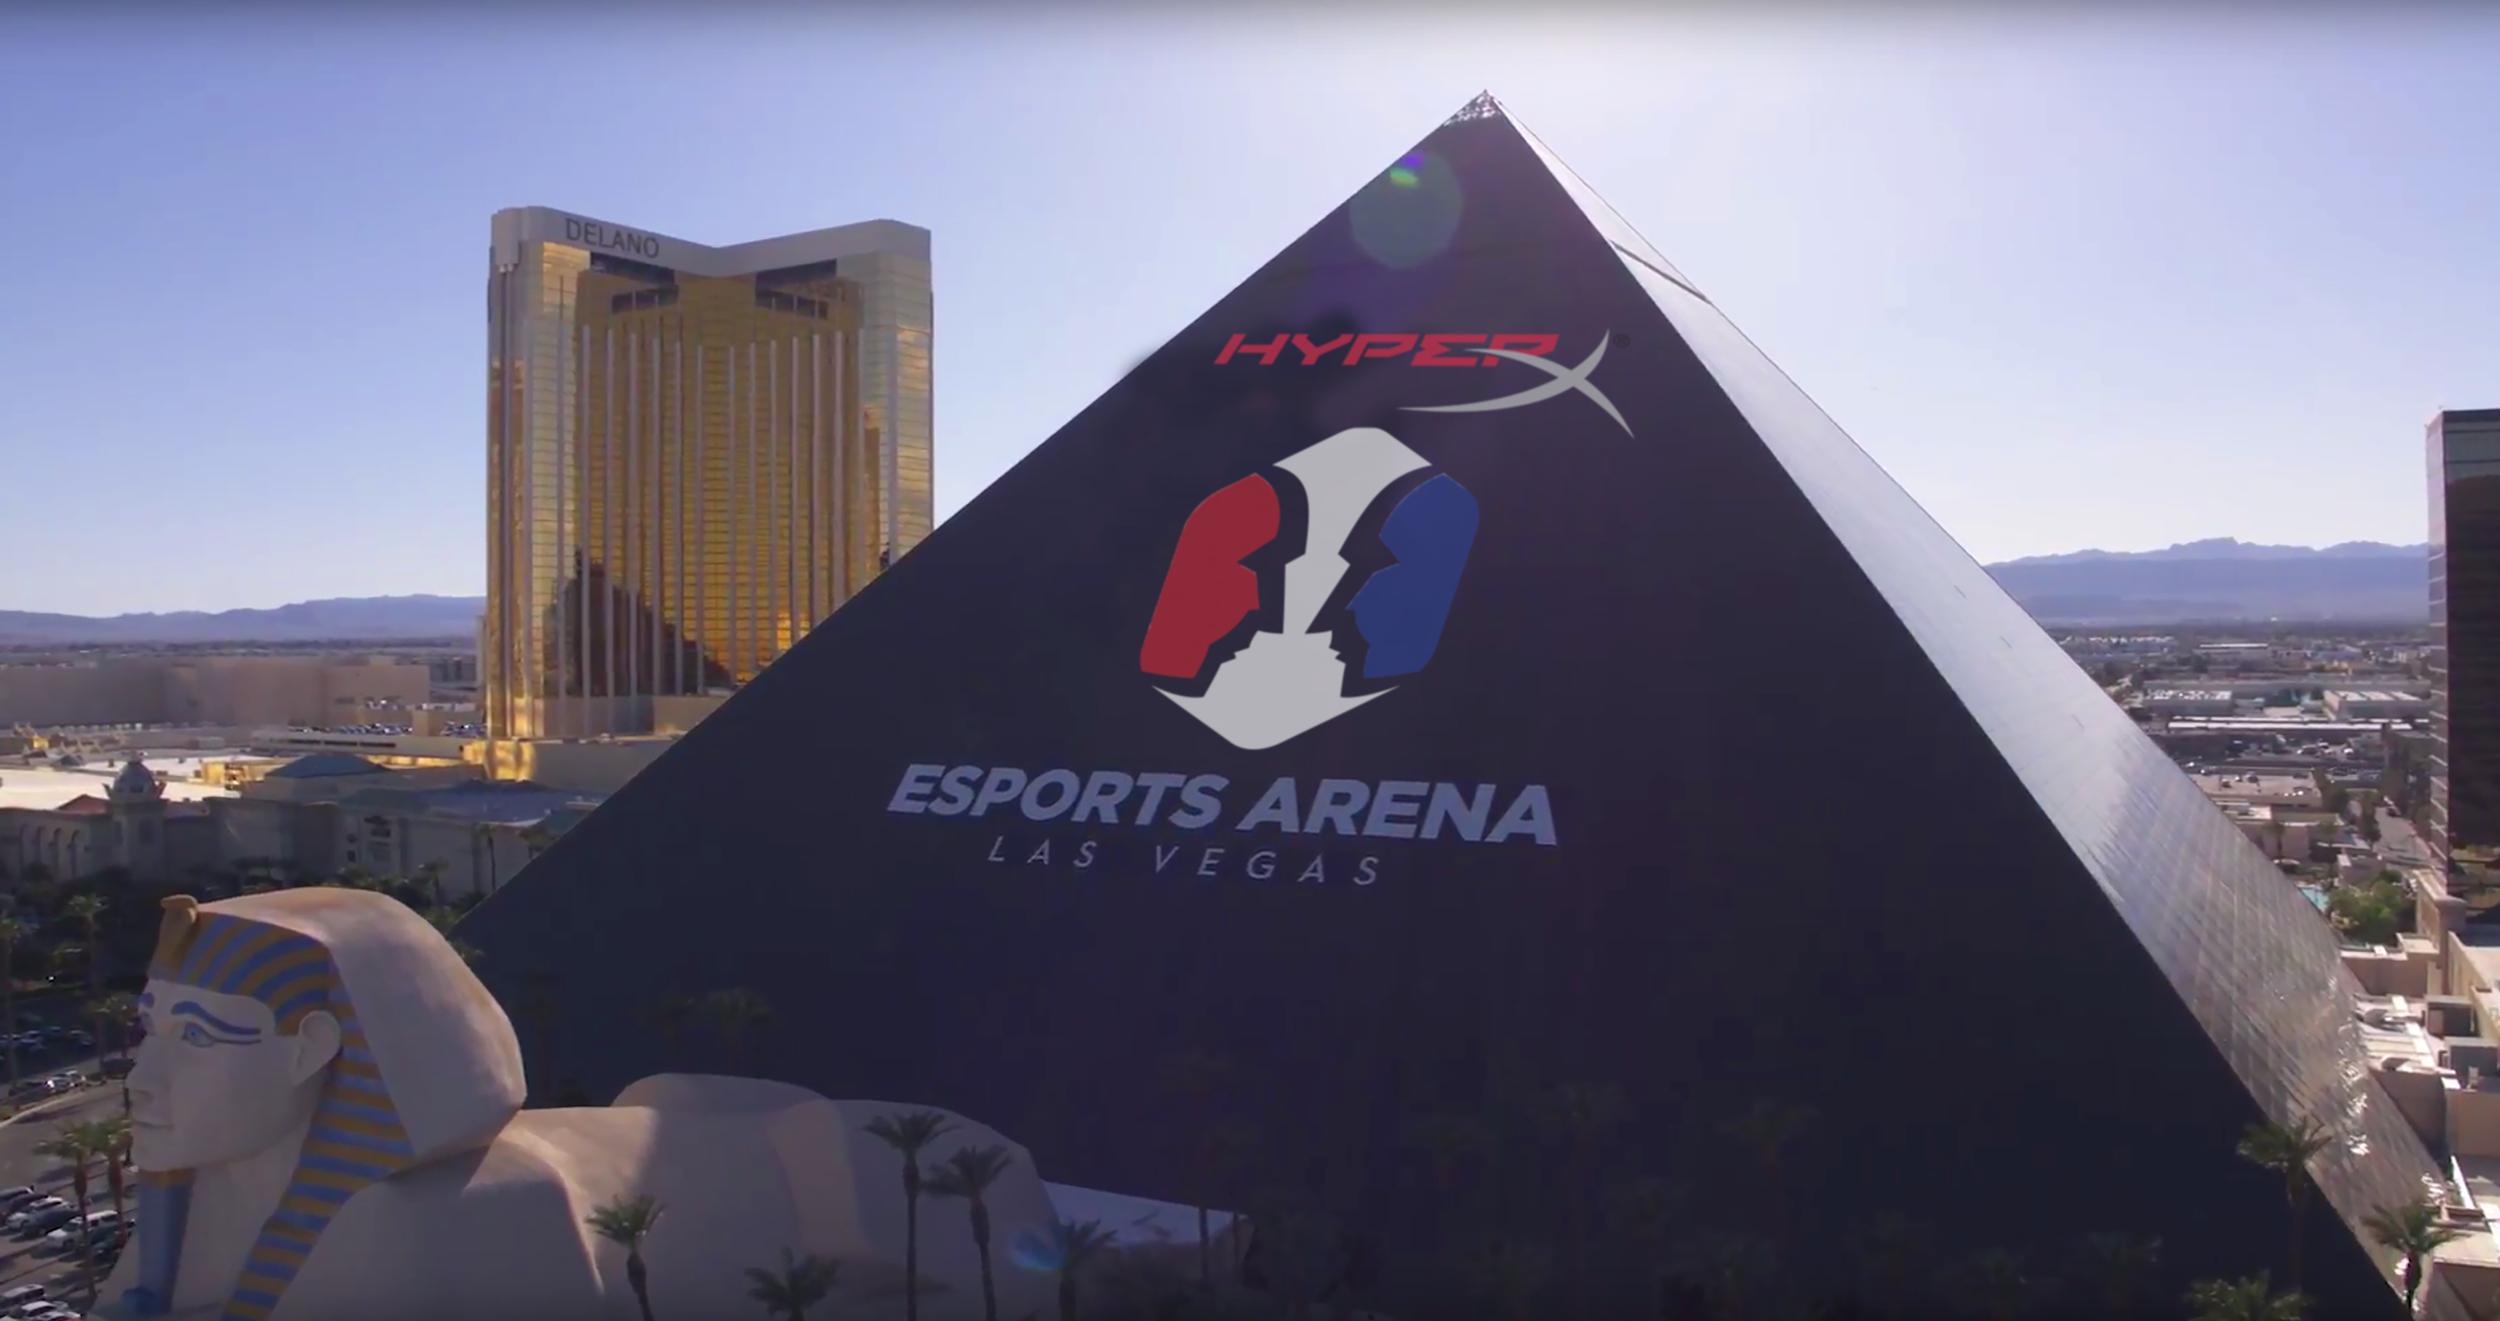 via HyperX Esports Arena Las Vegas